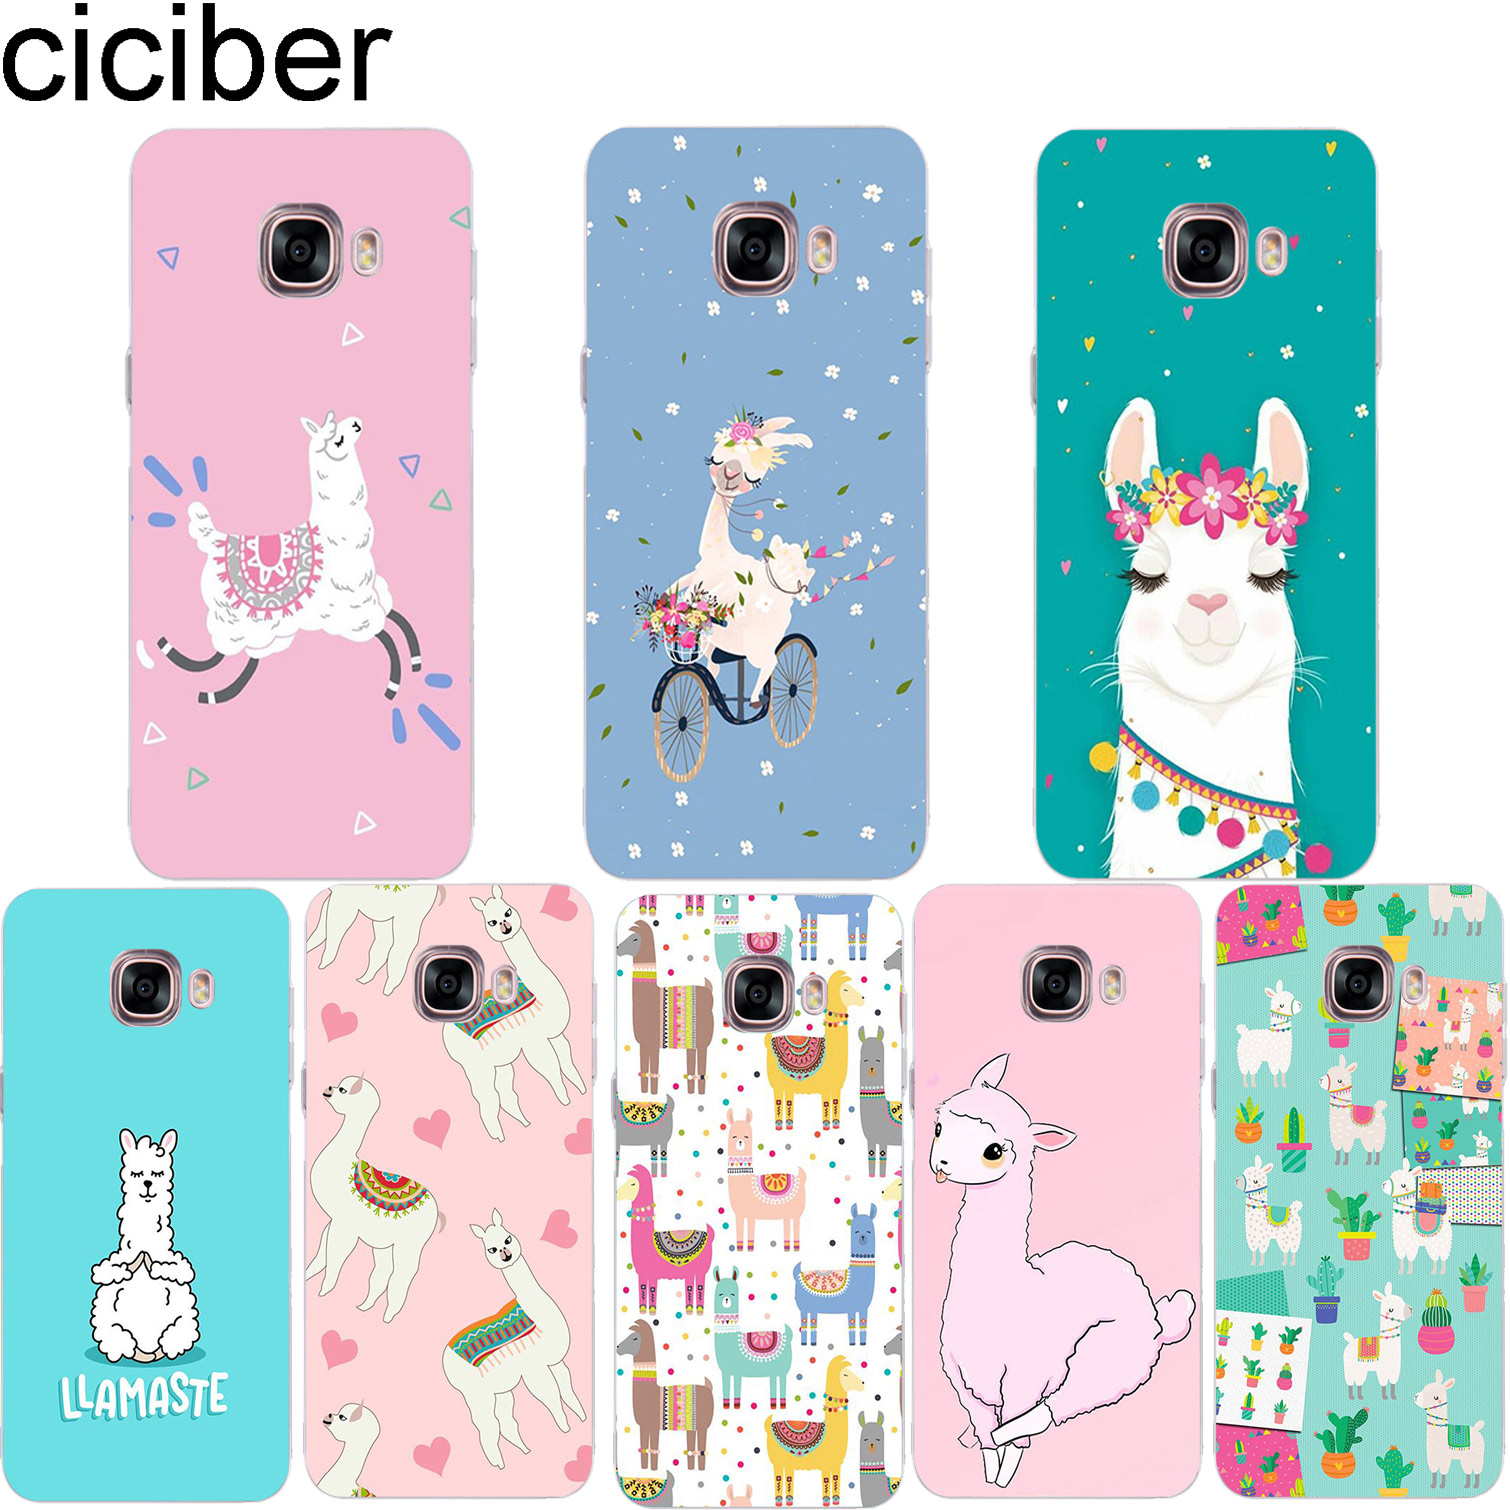 ciciber Cute Llama Animals Phone Case for Samsung Galaxy Note 9 8 3 4 5 Soft TPU Cover C7 C9 C8 C5 Pro 2017 Coque